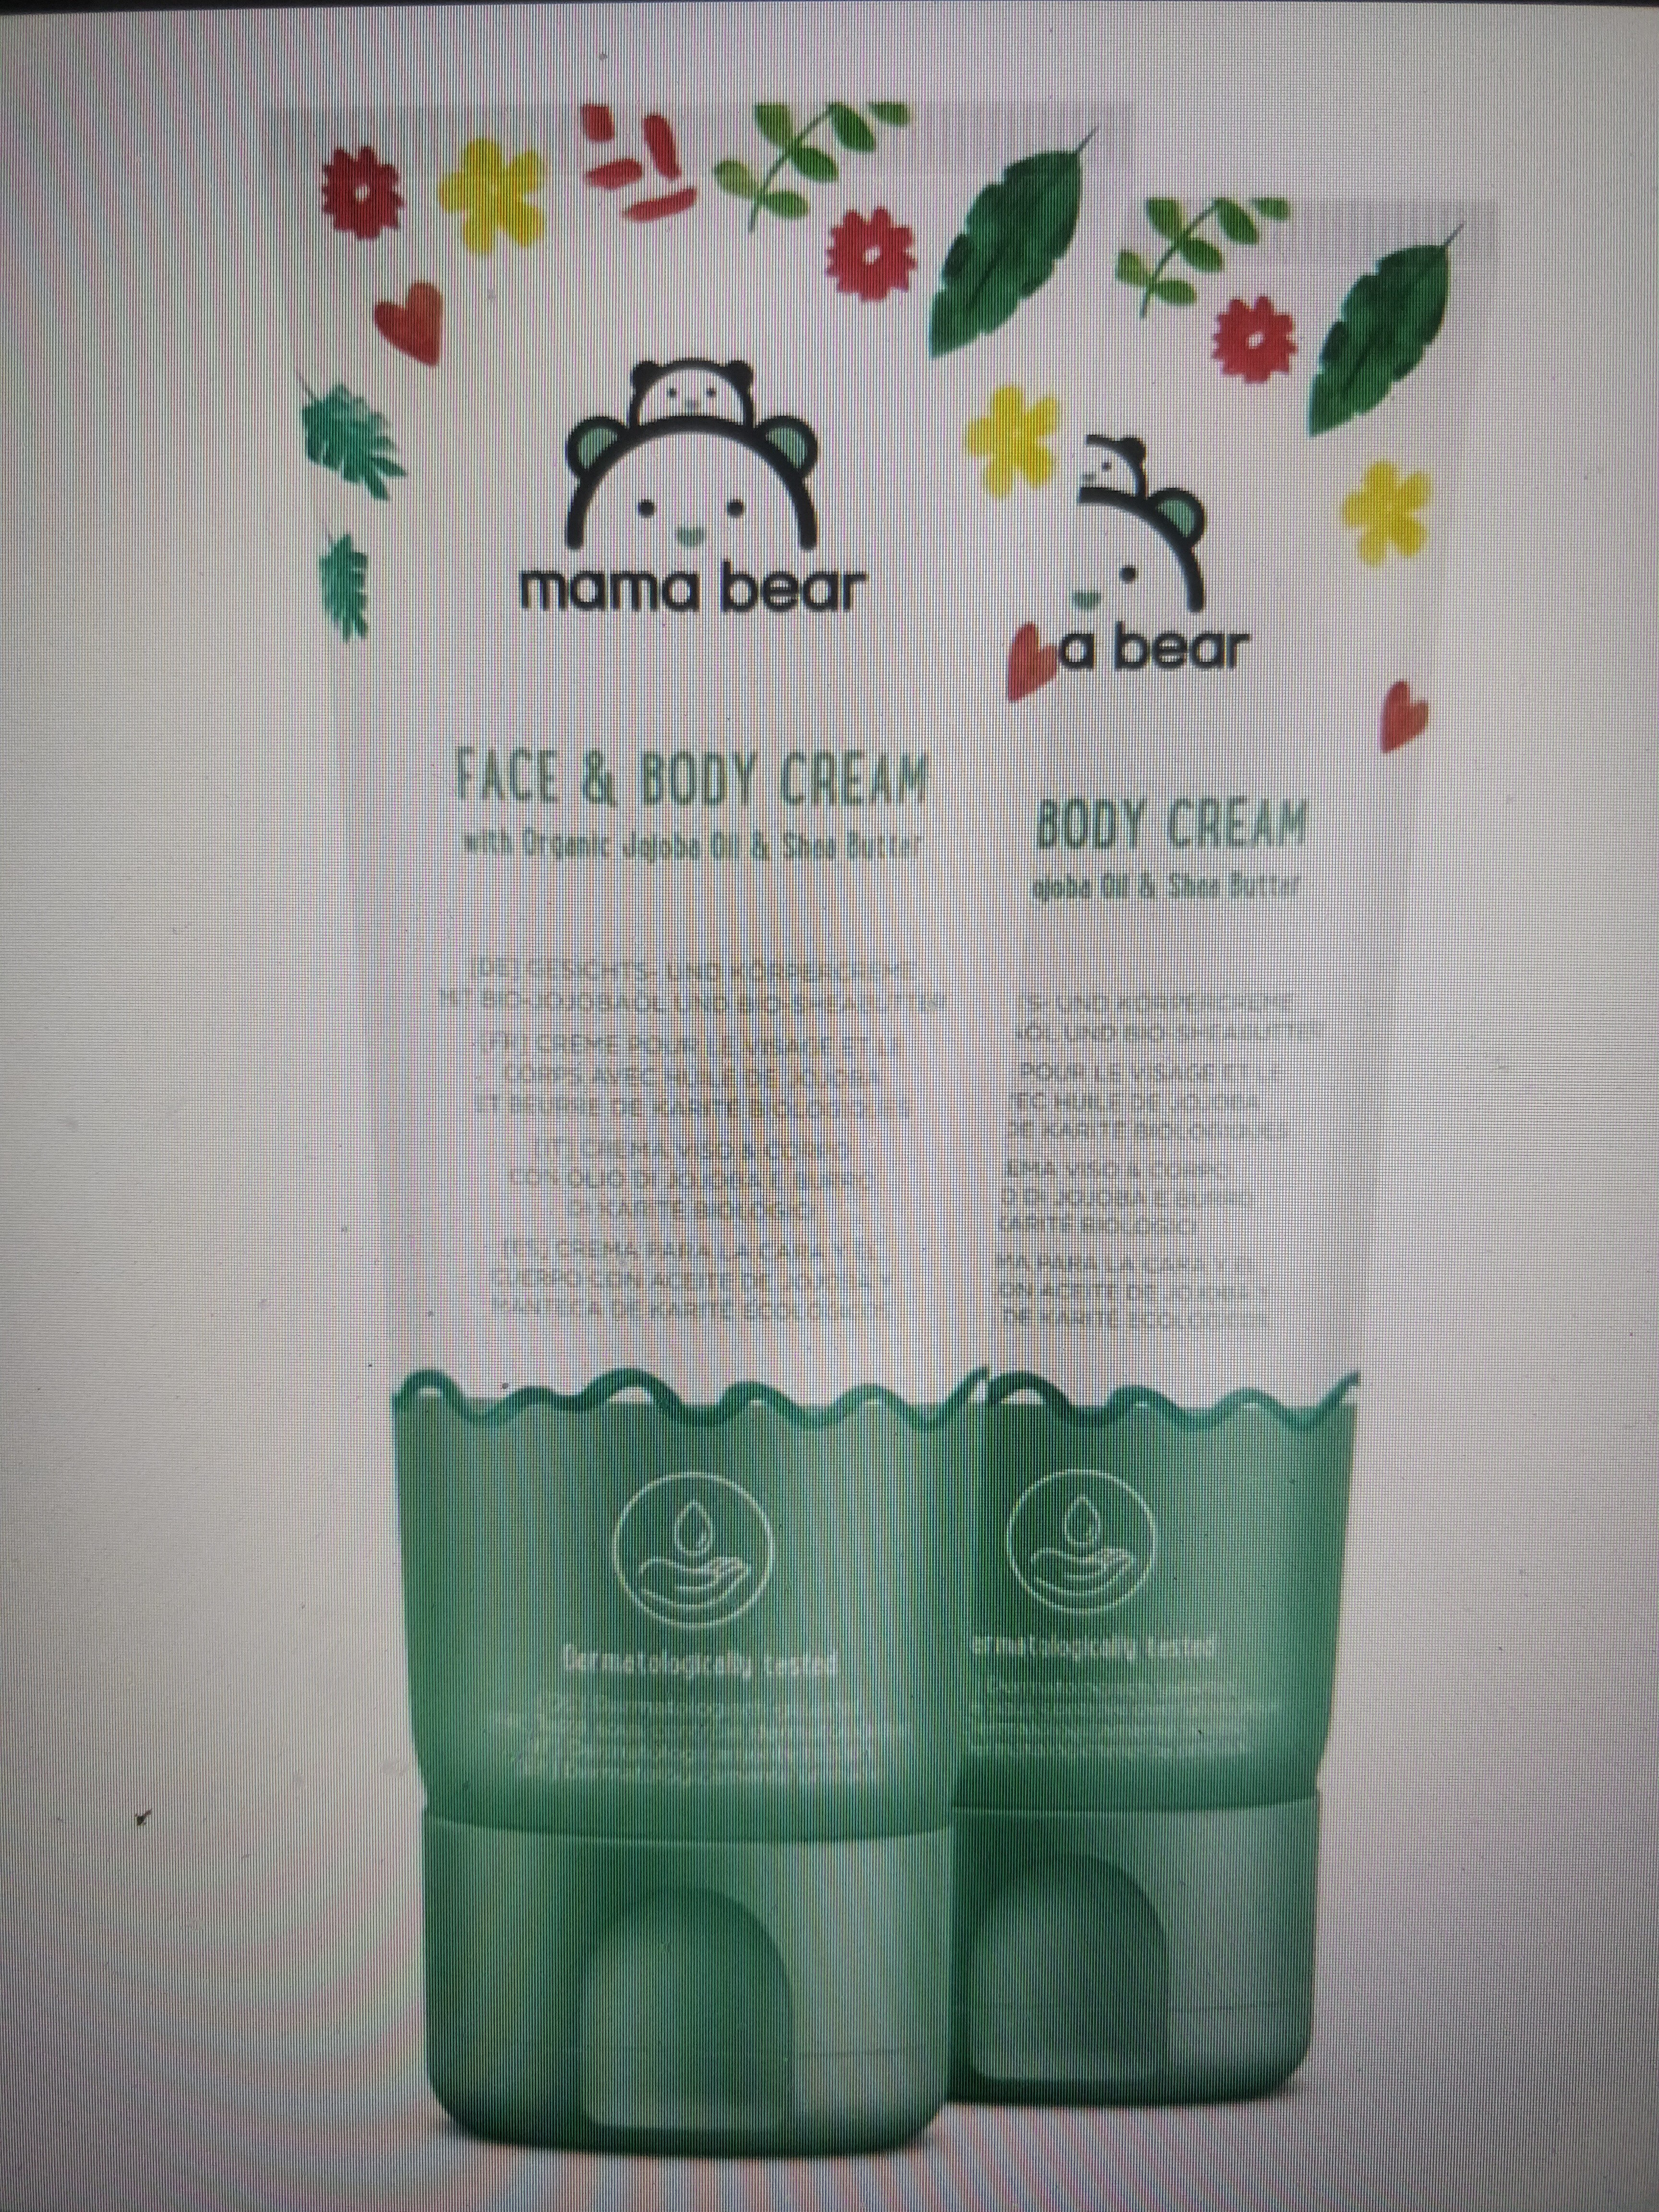 mama bear face & body cream - Produit - fr